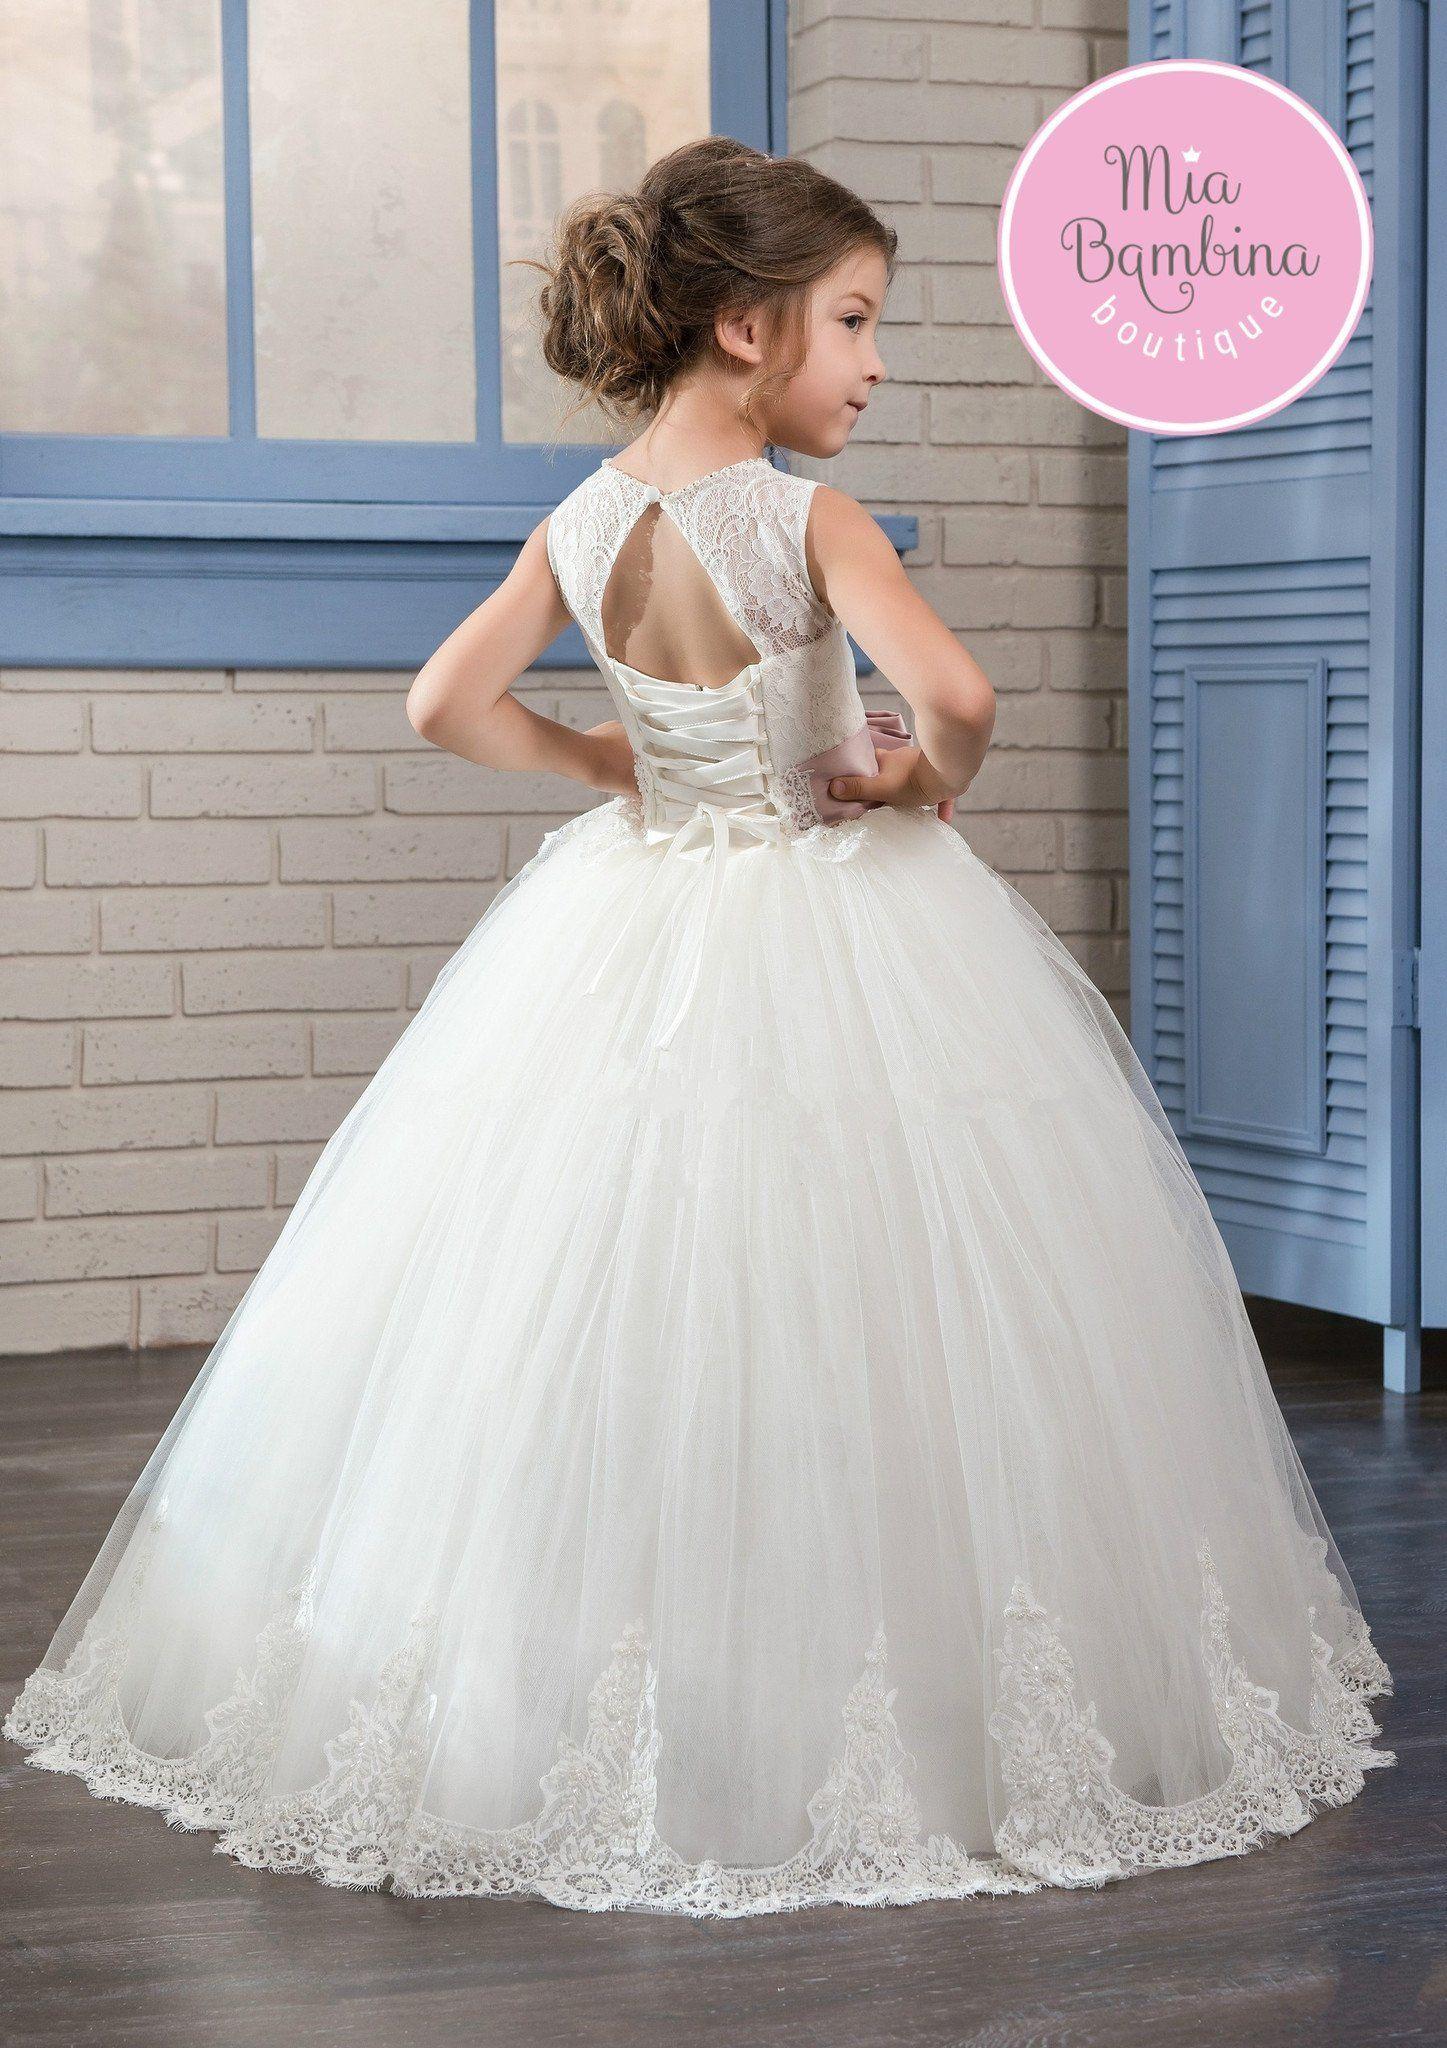 3/4 length lace wedding dress  Cincinnati  dina promo  Pinterest  Dresses Flower girl dresses